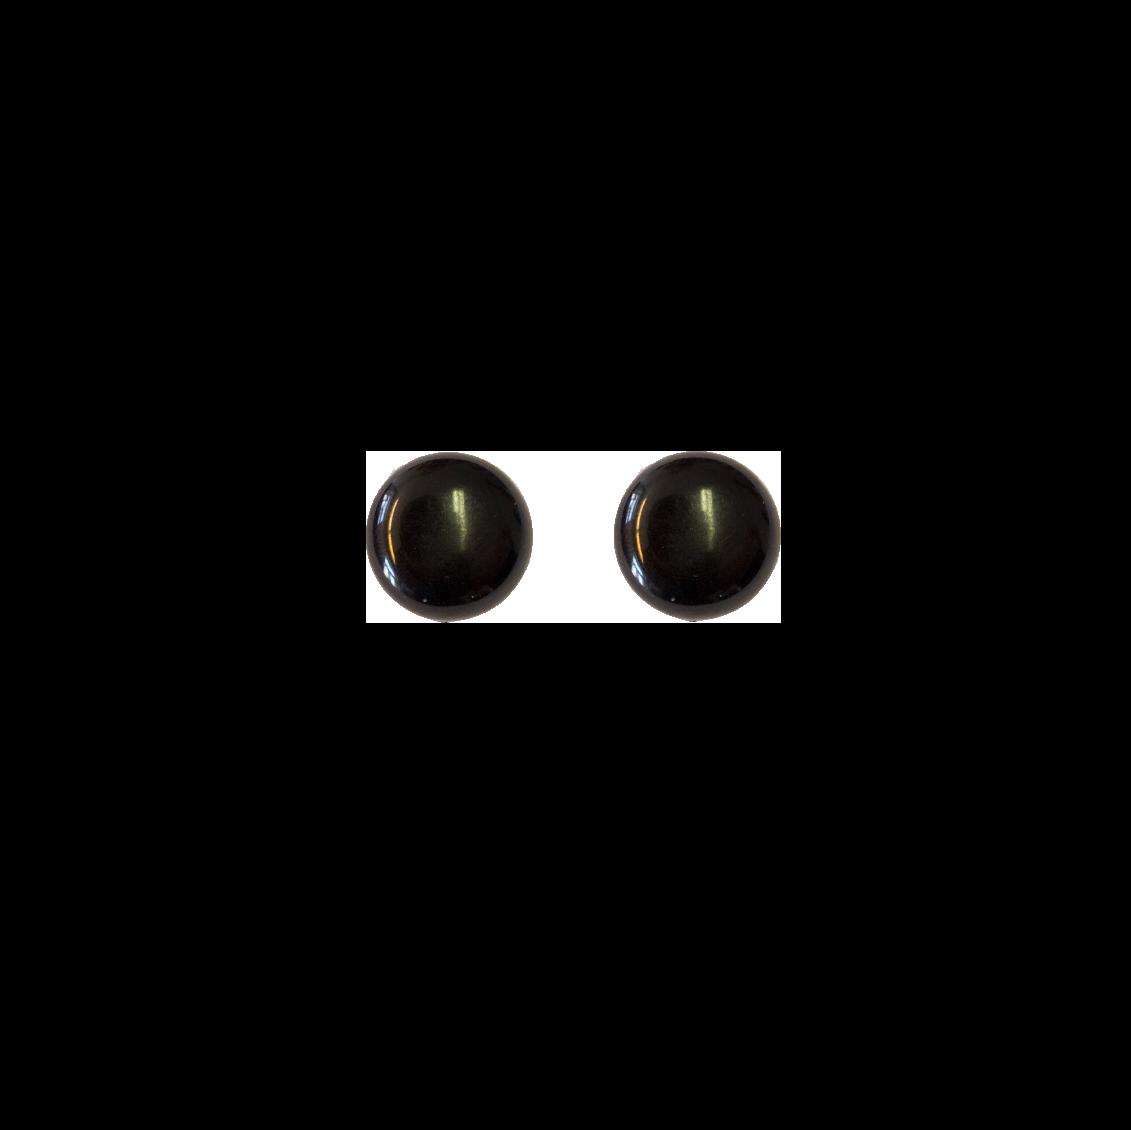 Mustat muovikorvakorut